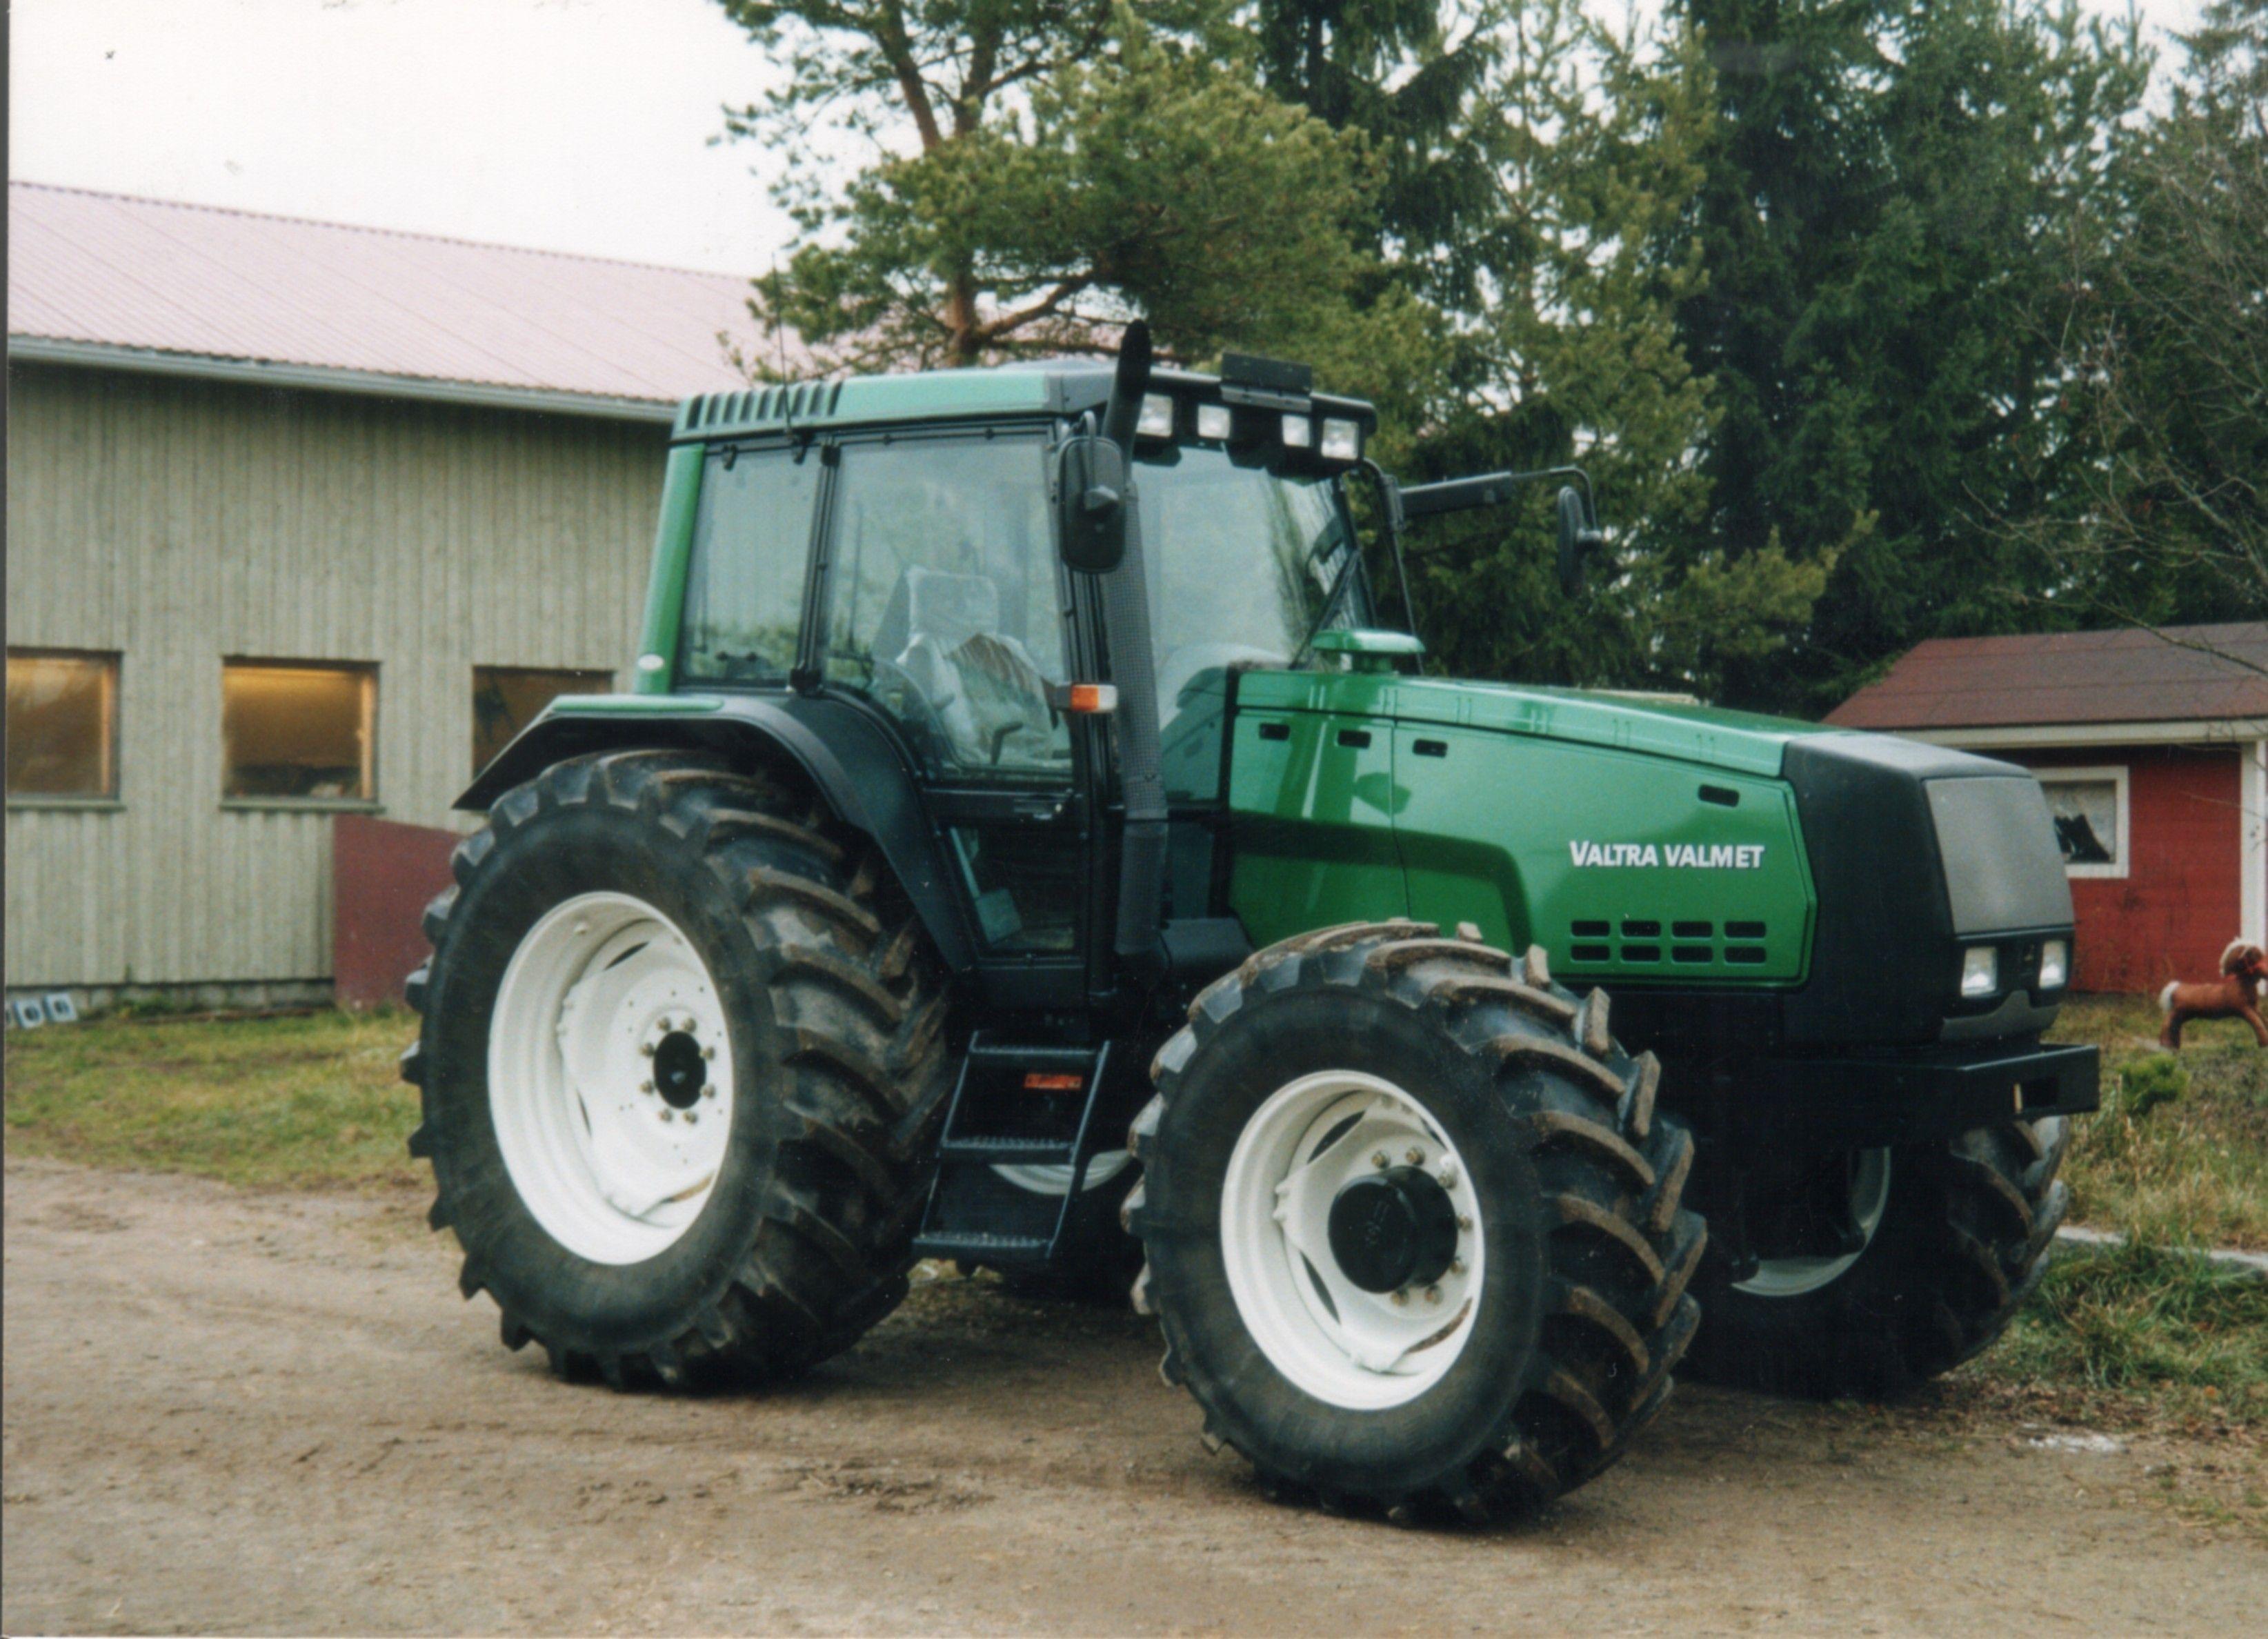 valtravalmet 8350 �� tractor mania �� pinterest tractor